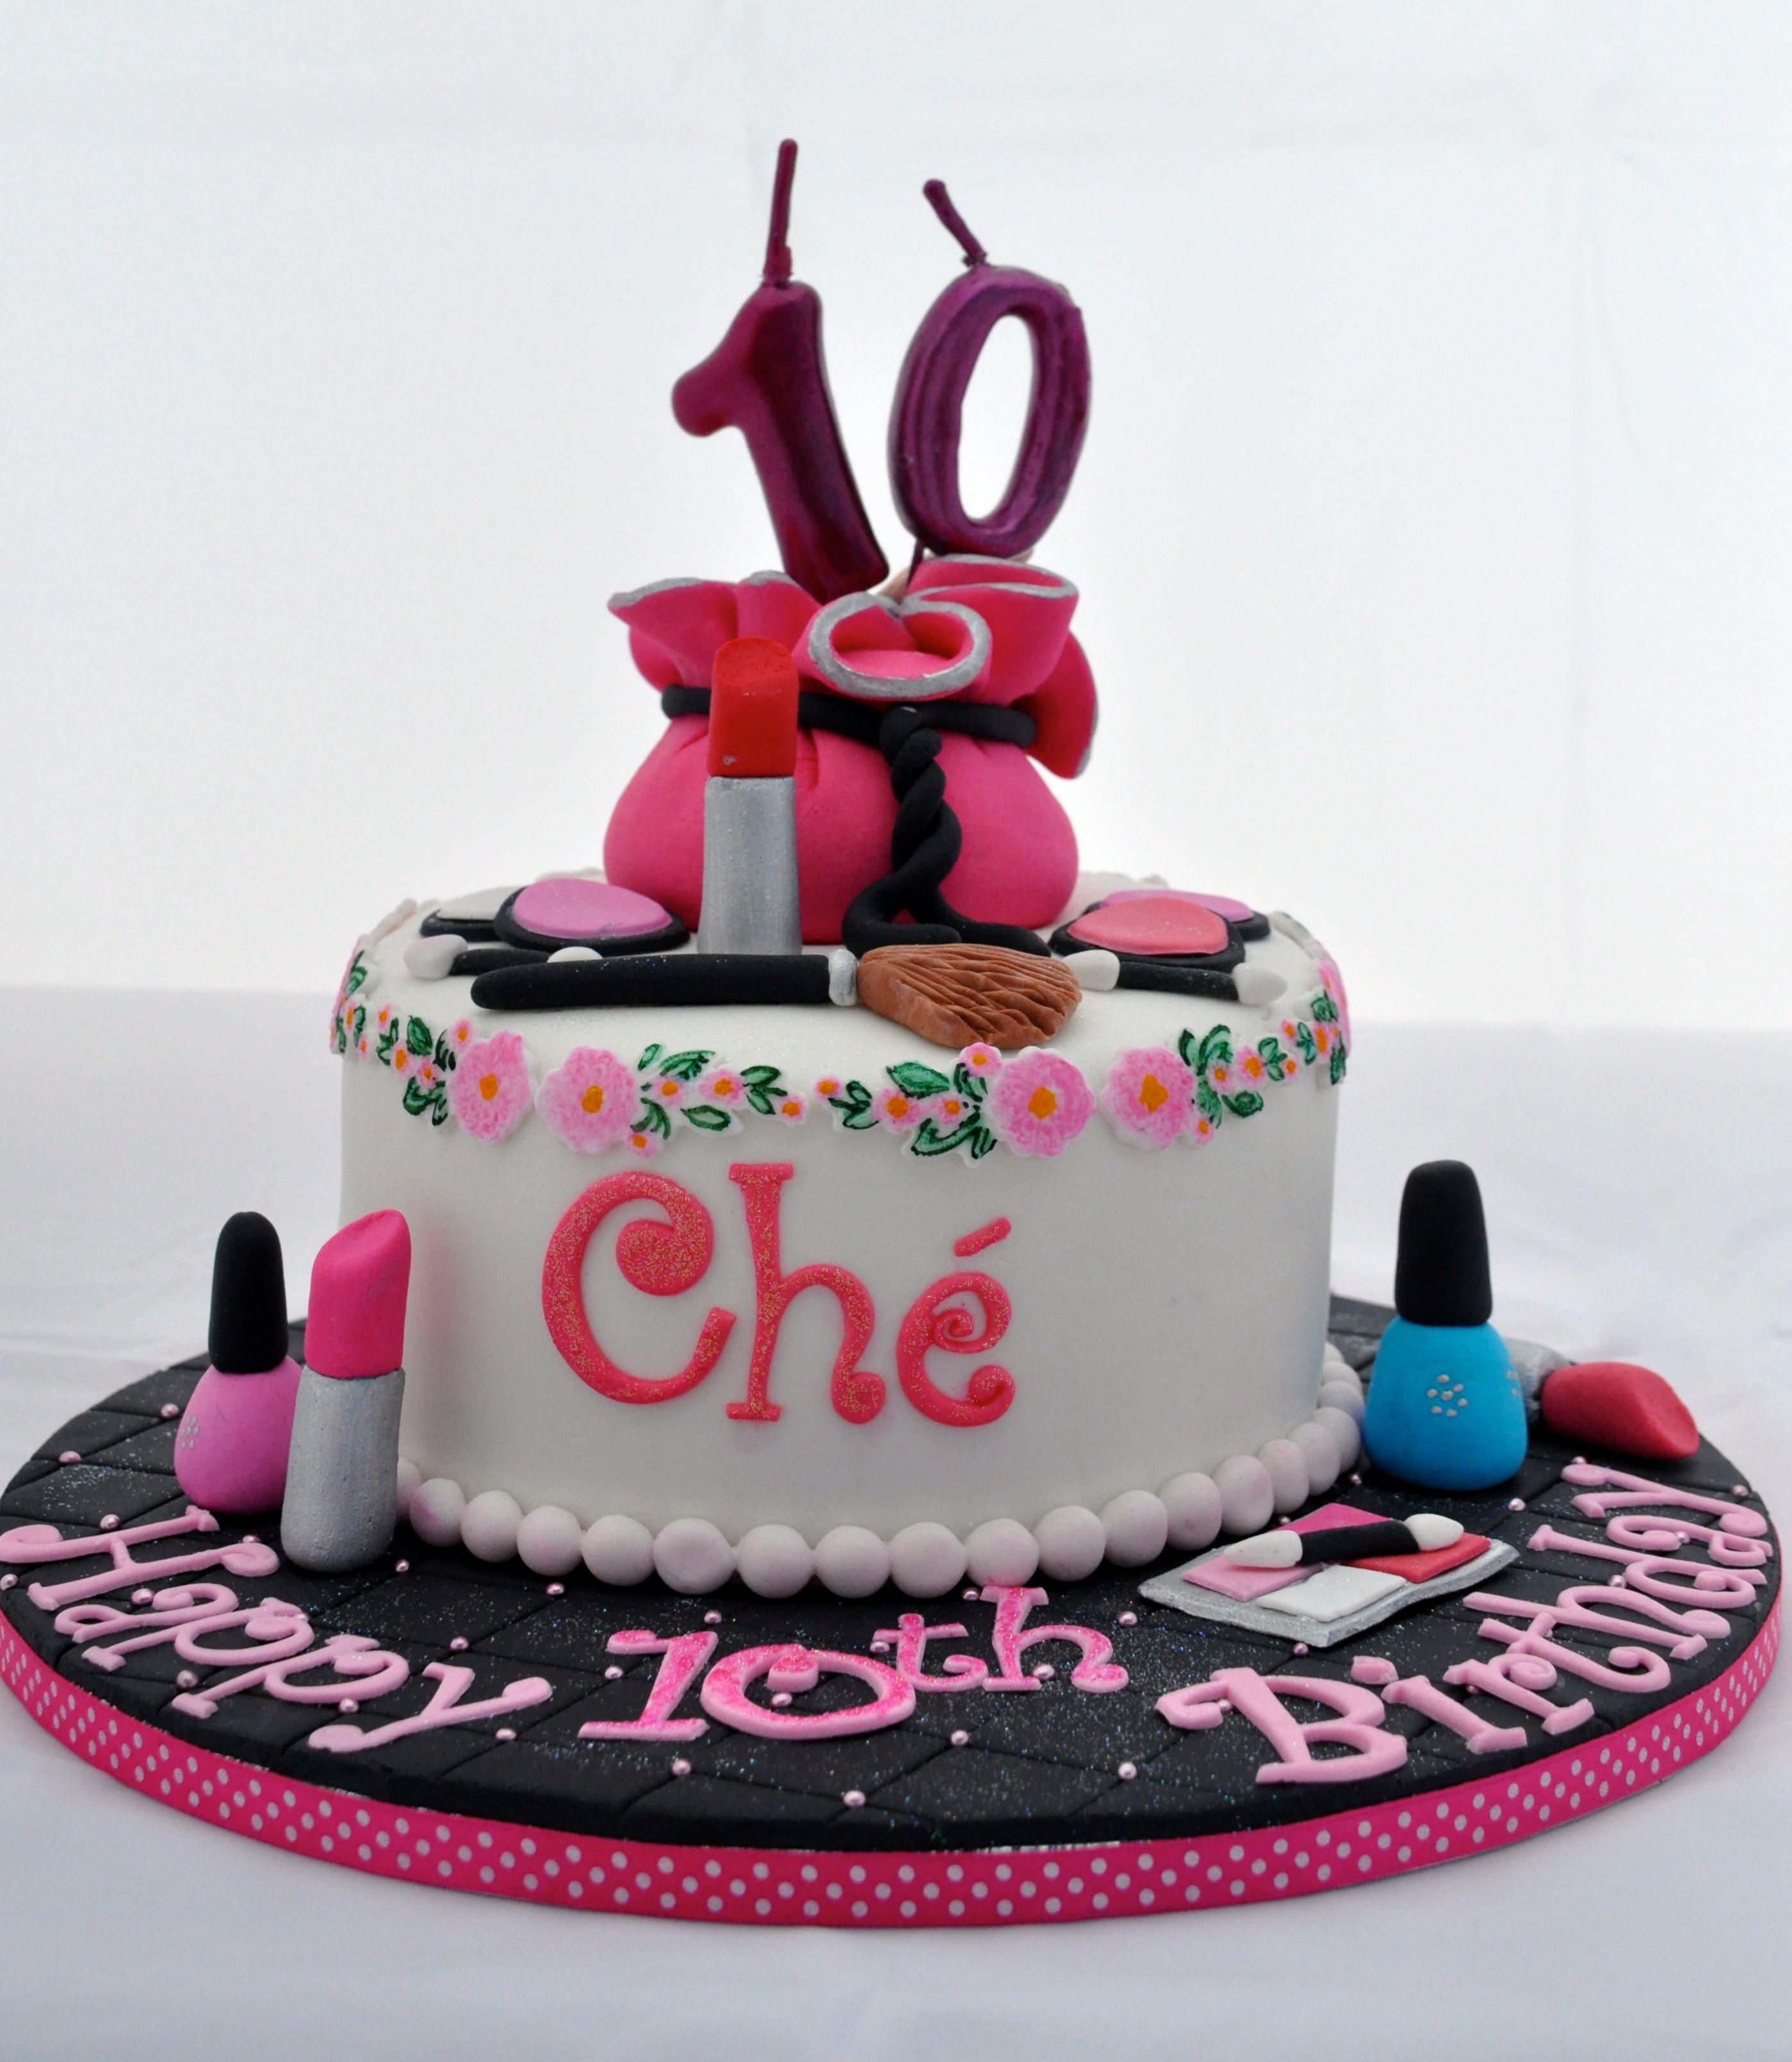 Nail Cakes Bakery: Make-up Cake With Lipstick, Blush, Eye Shadow And Nail